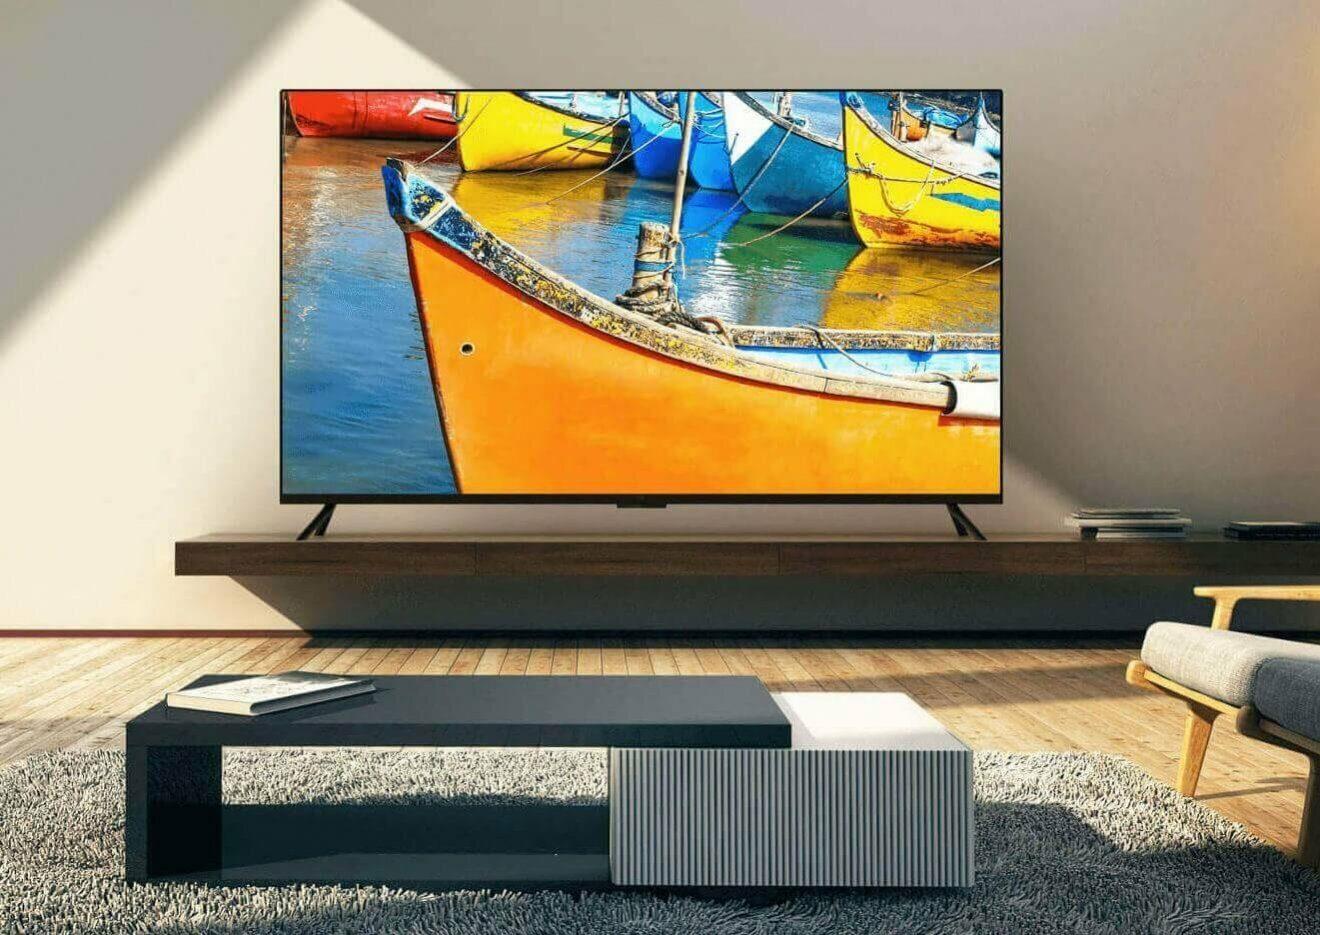 Xiaomi-Mi-LED-Smart-TV-4C-crop